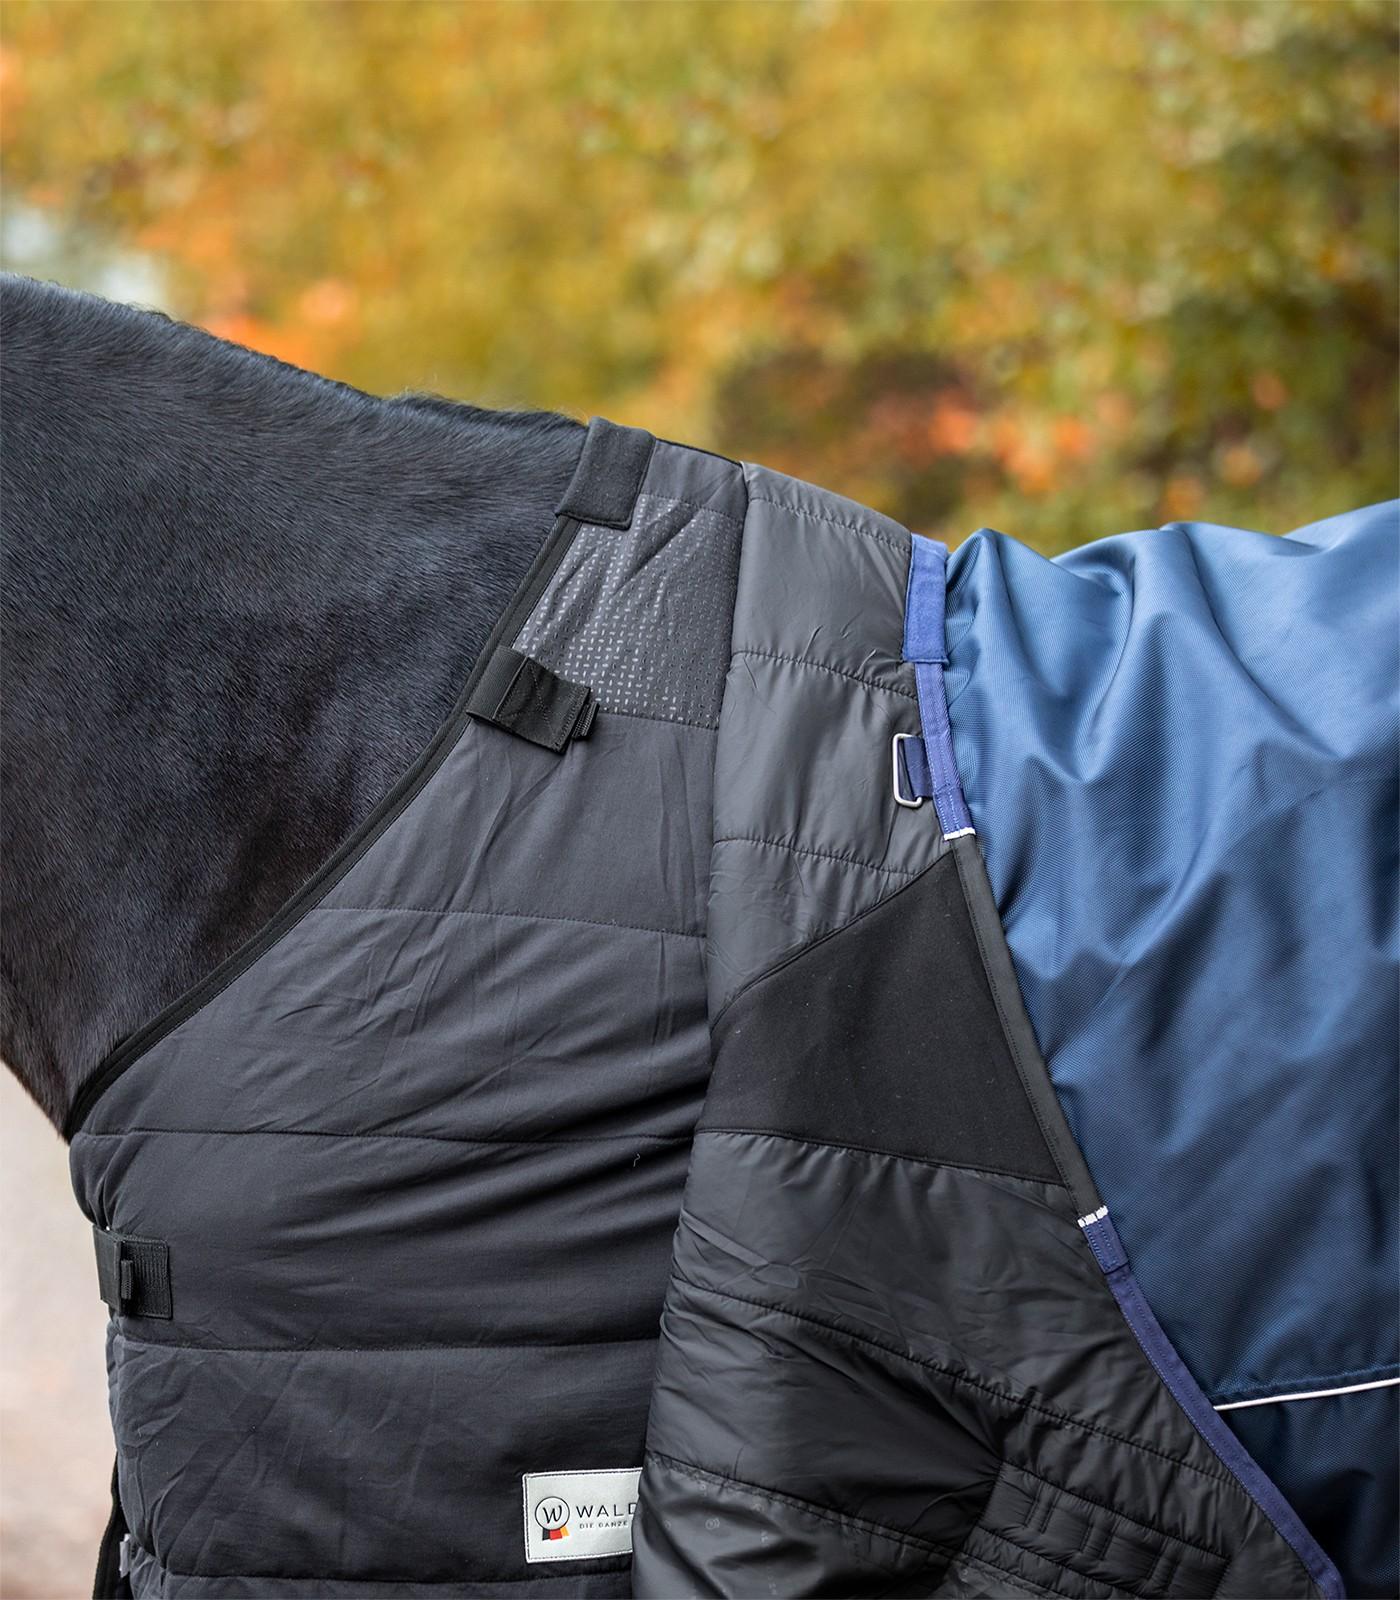 couverture High neck premium 200gr waldhausen - Equestra